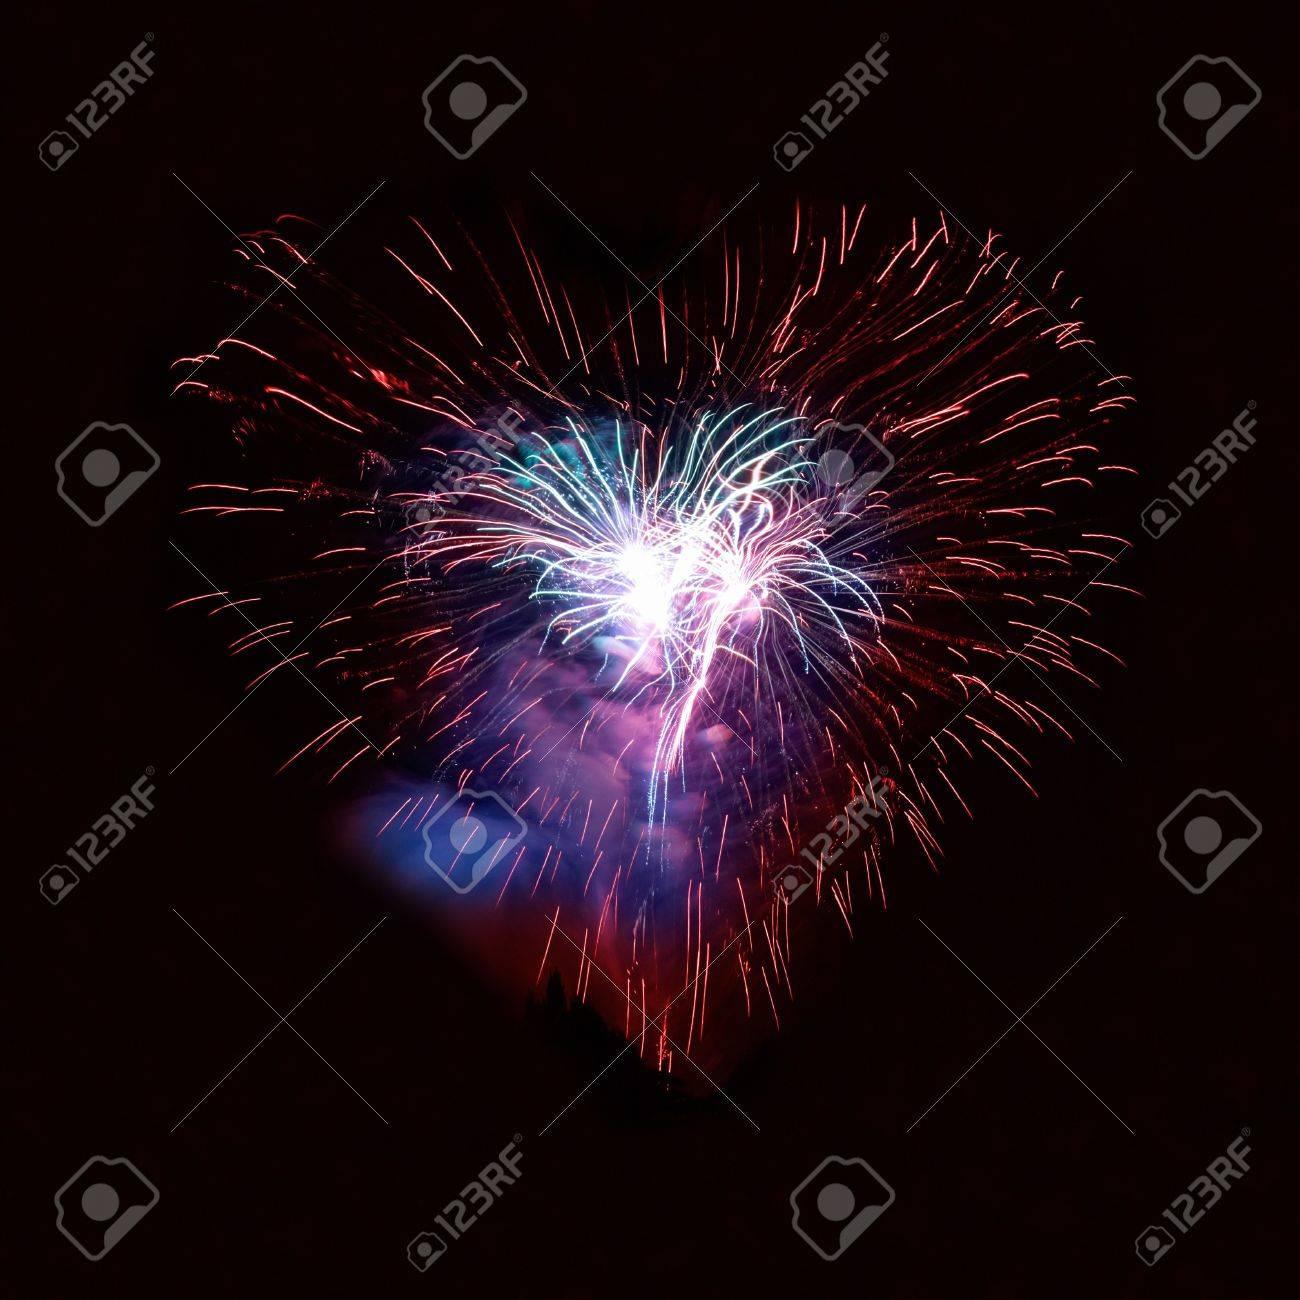 Heart fireworks on the black sky background Stock Photo - 8192257